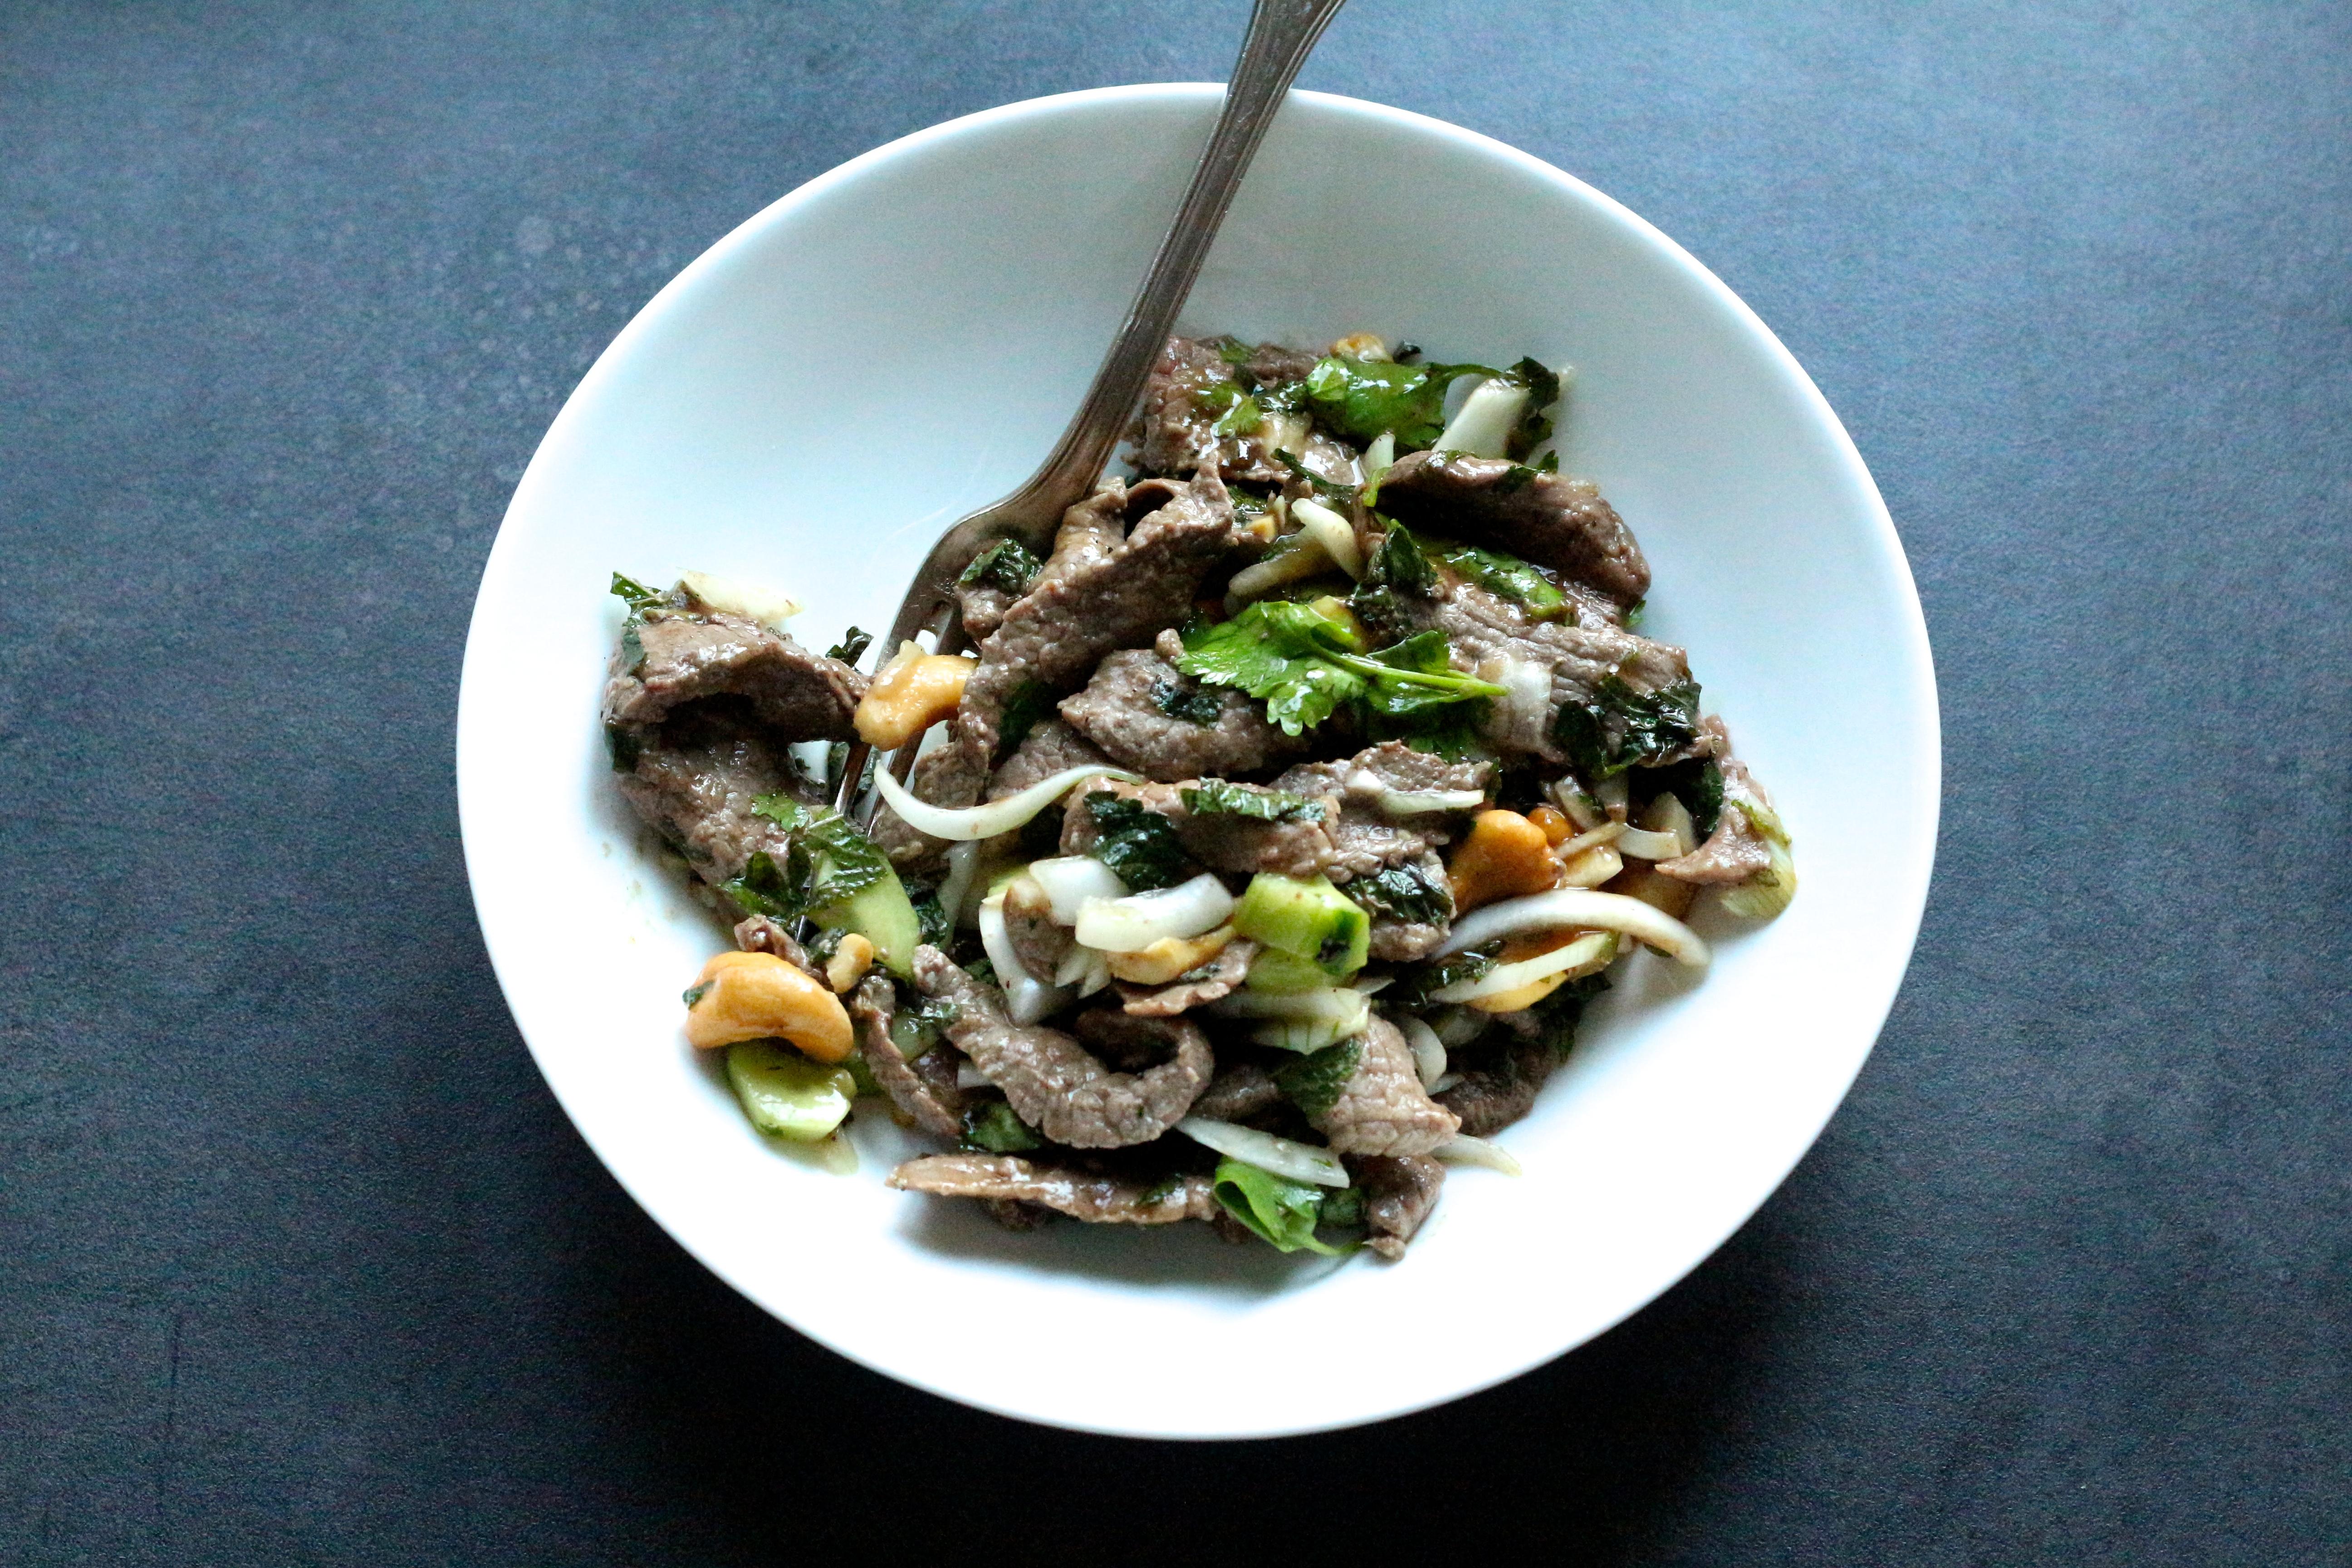 Salade de boeuf thaï / beef thaï salad